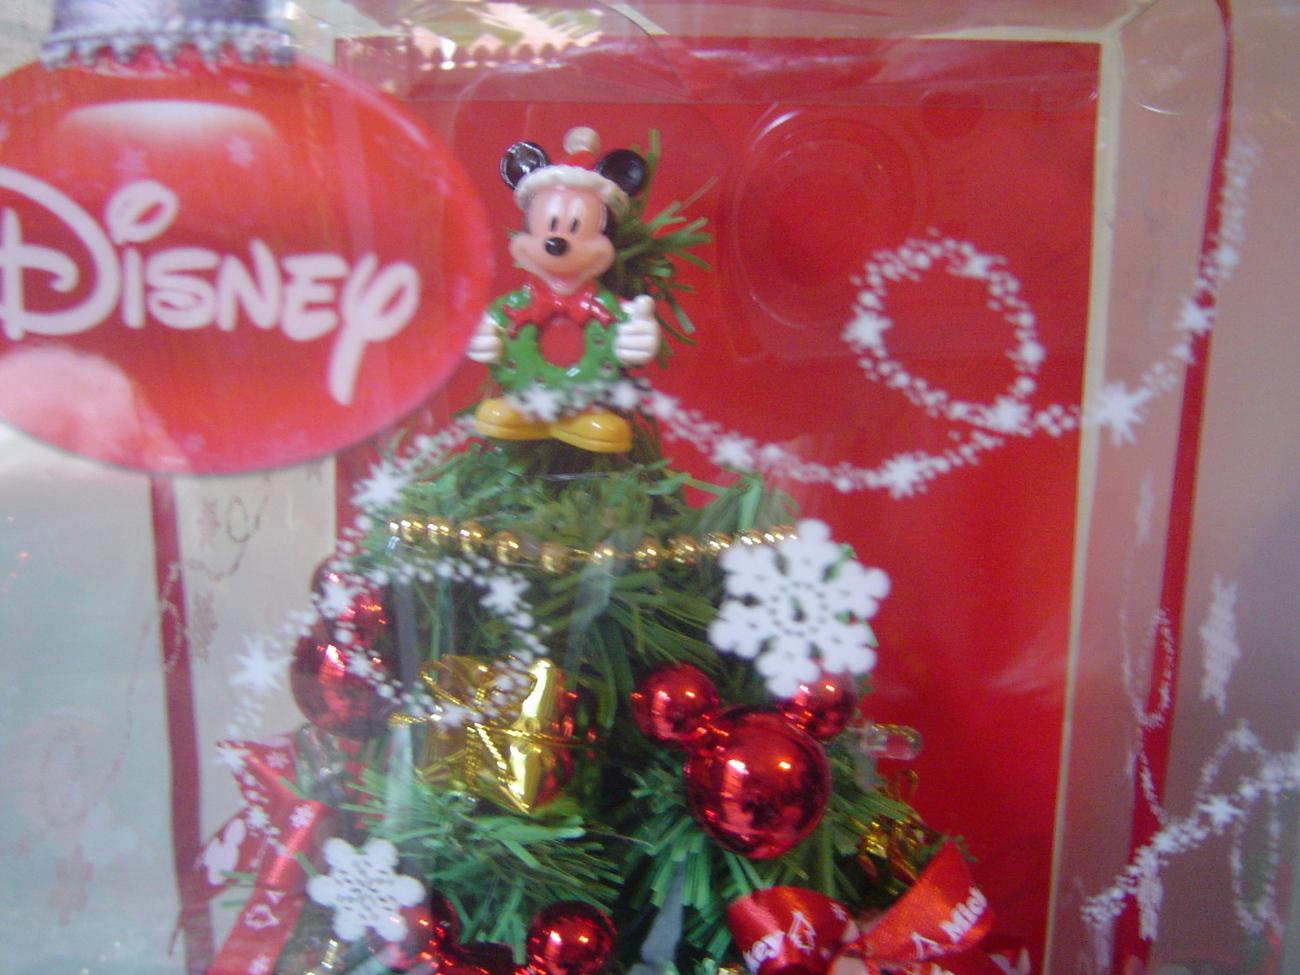 Disney Mickey Mouse Light Up Musical Christmas Tree